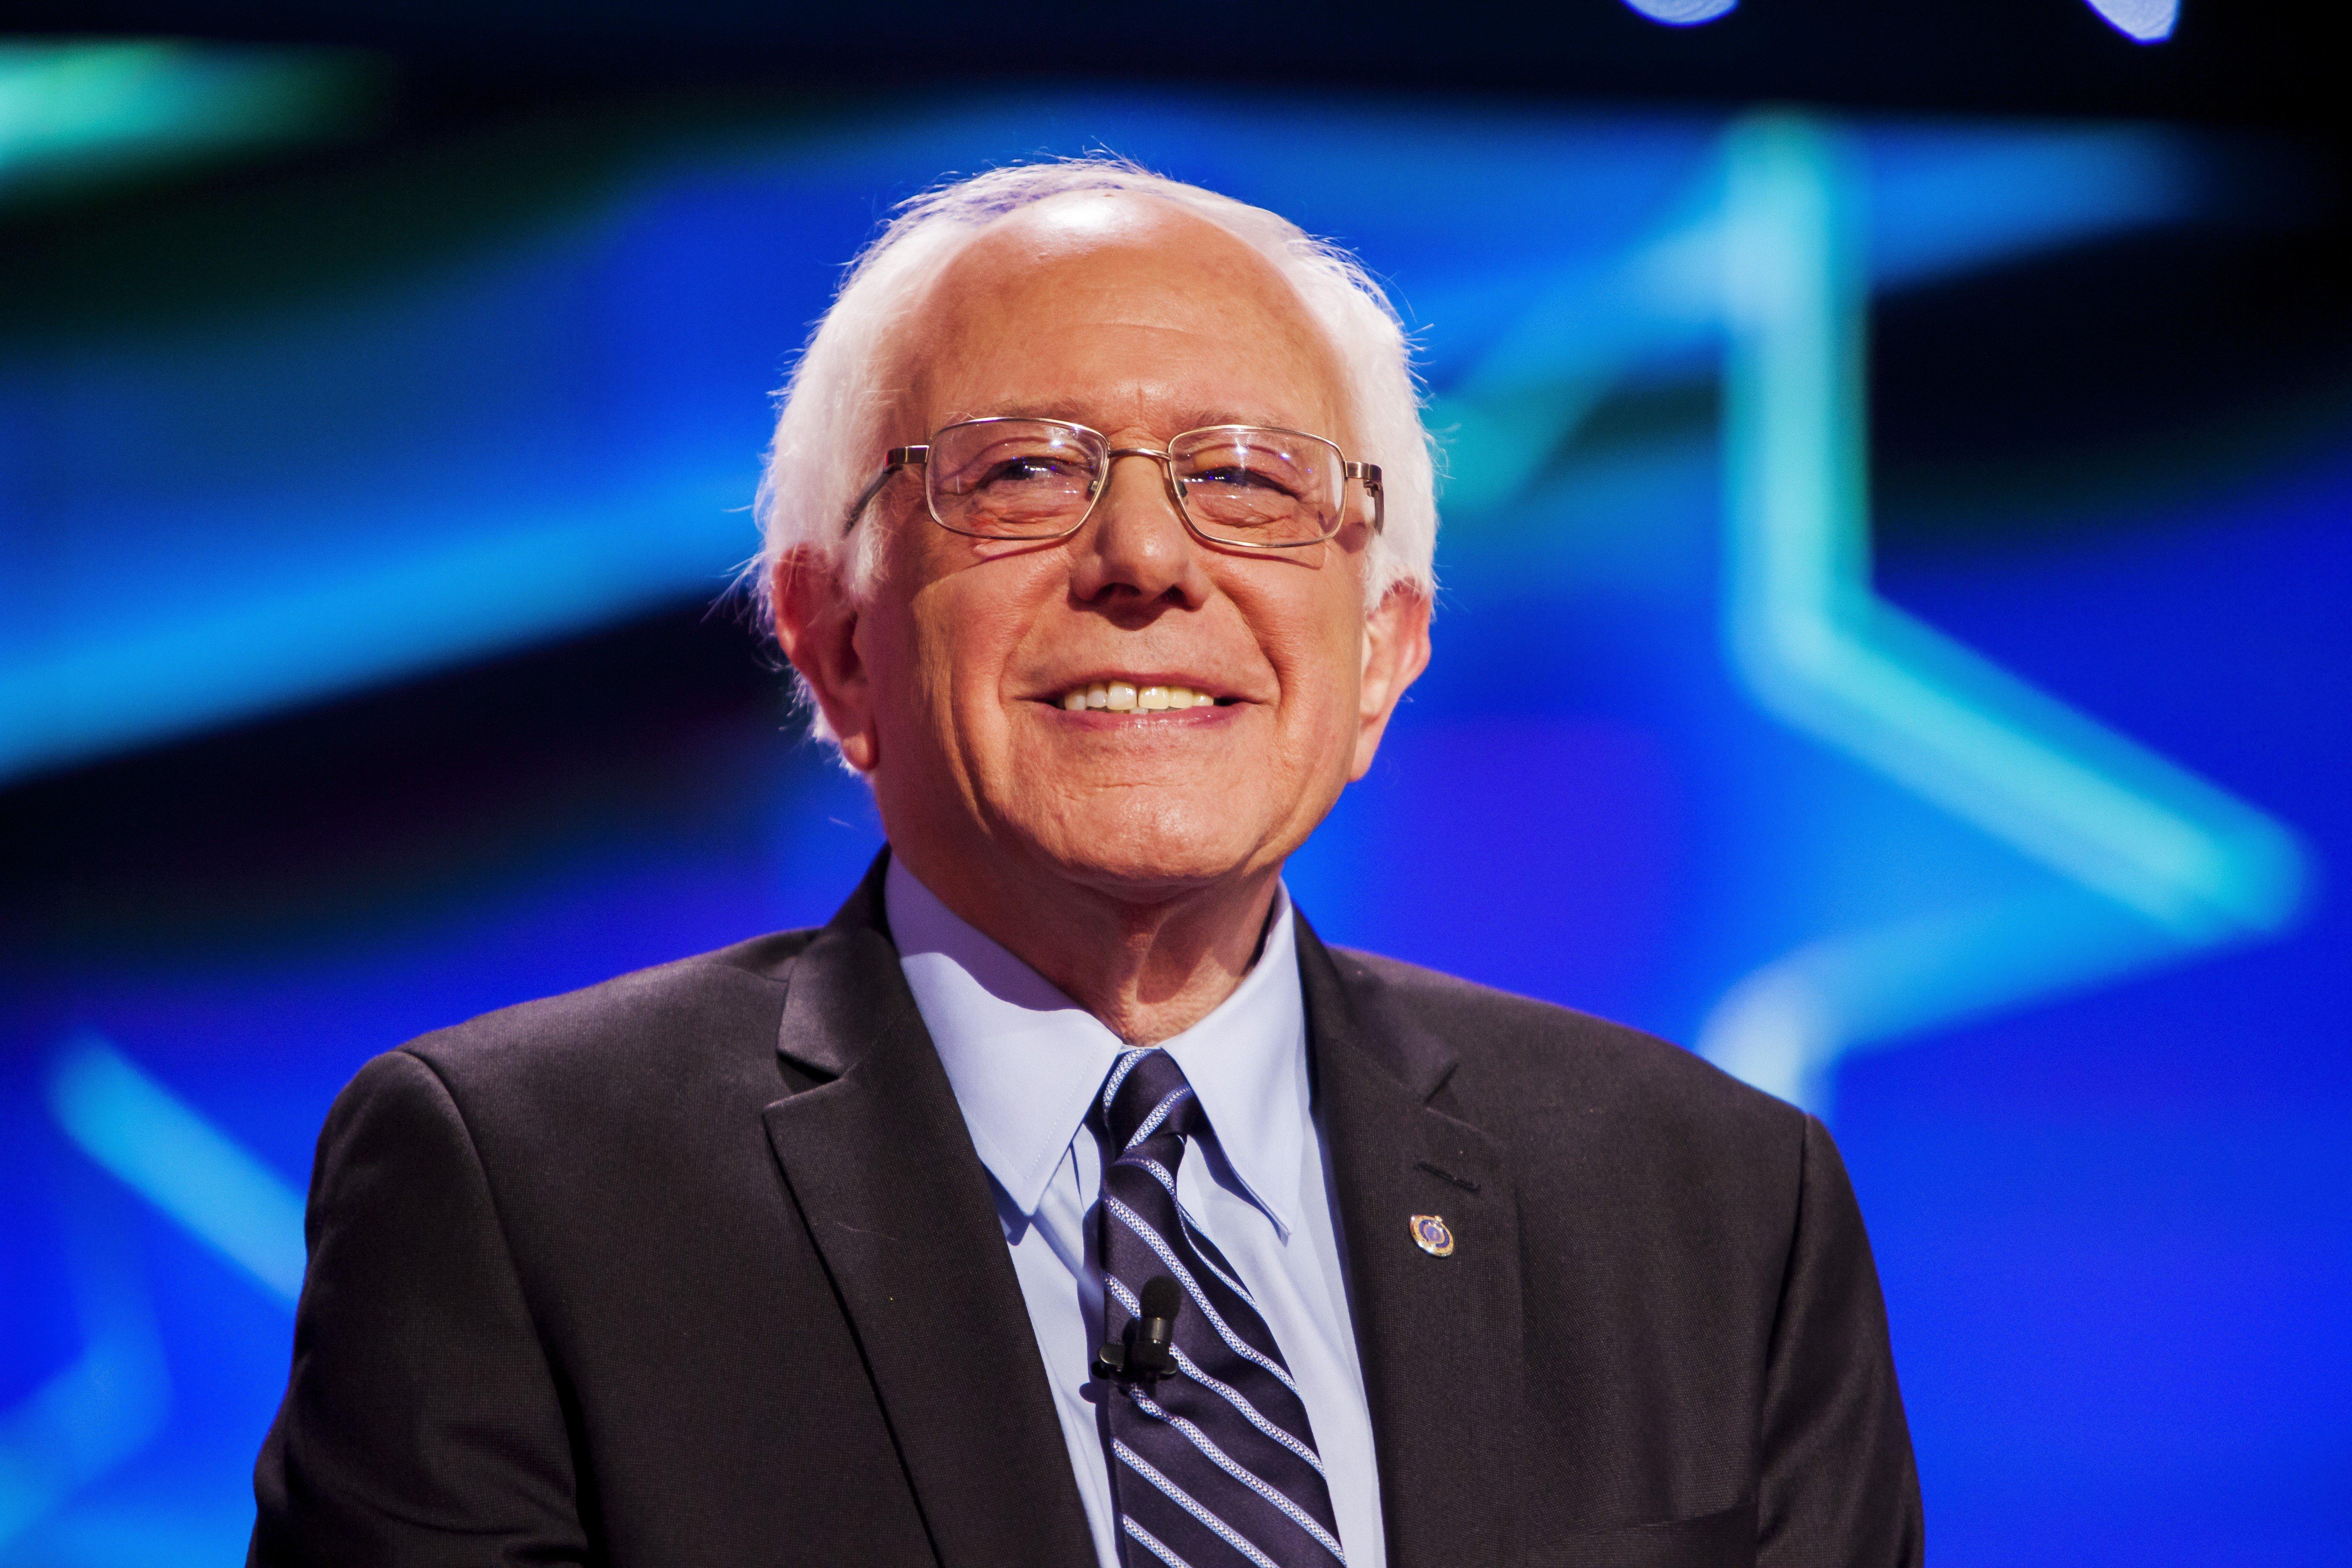 Bernie Sanders at the first Democratic Presidential Debate at the Wynn Hotel in Las Vegas on Oct. 13, 2015.